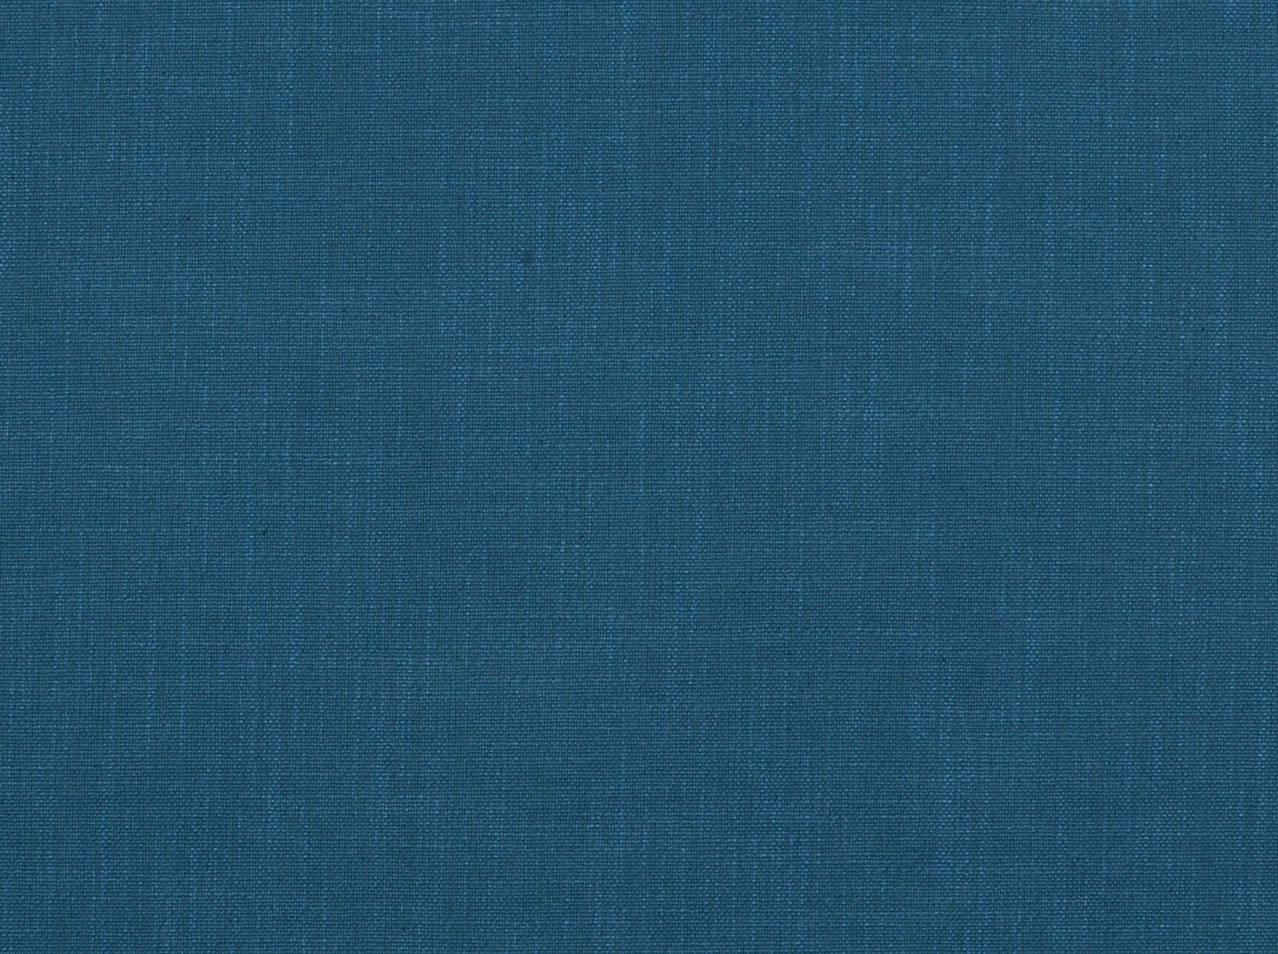 Hp bristol 52 Cabana Blue